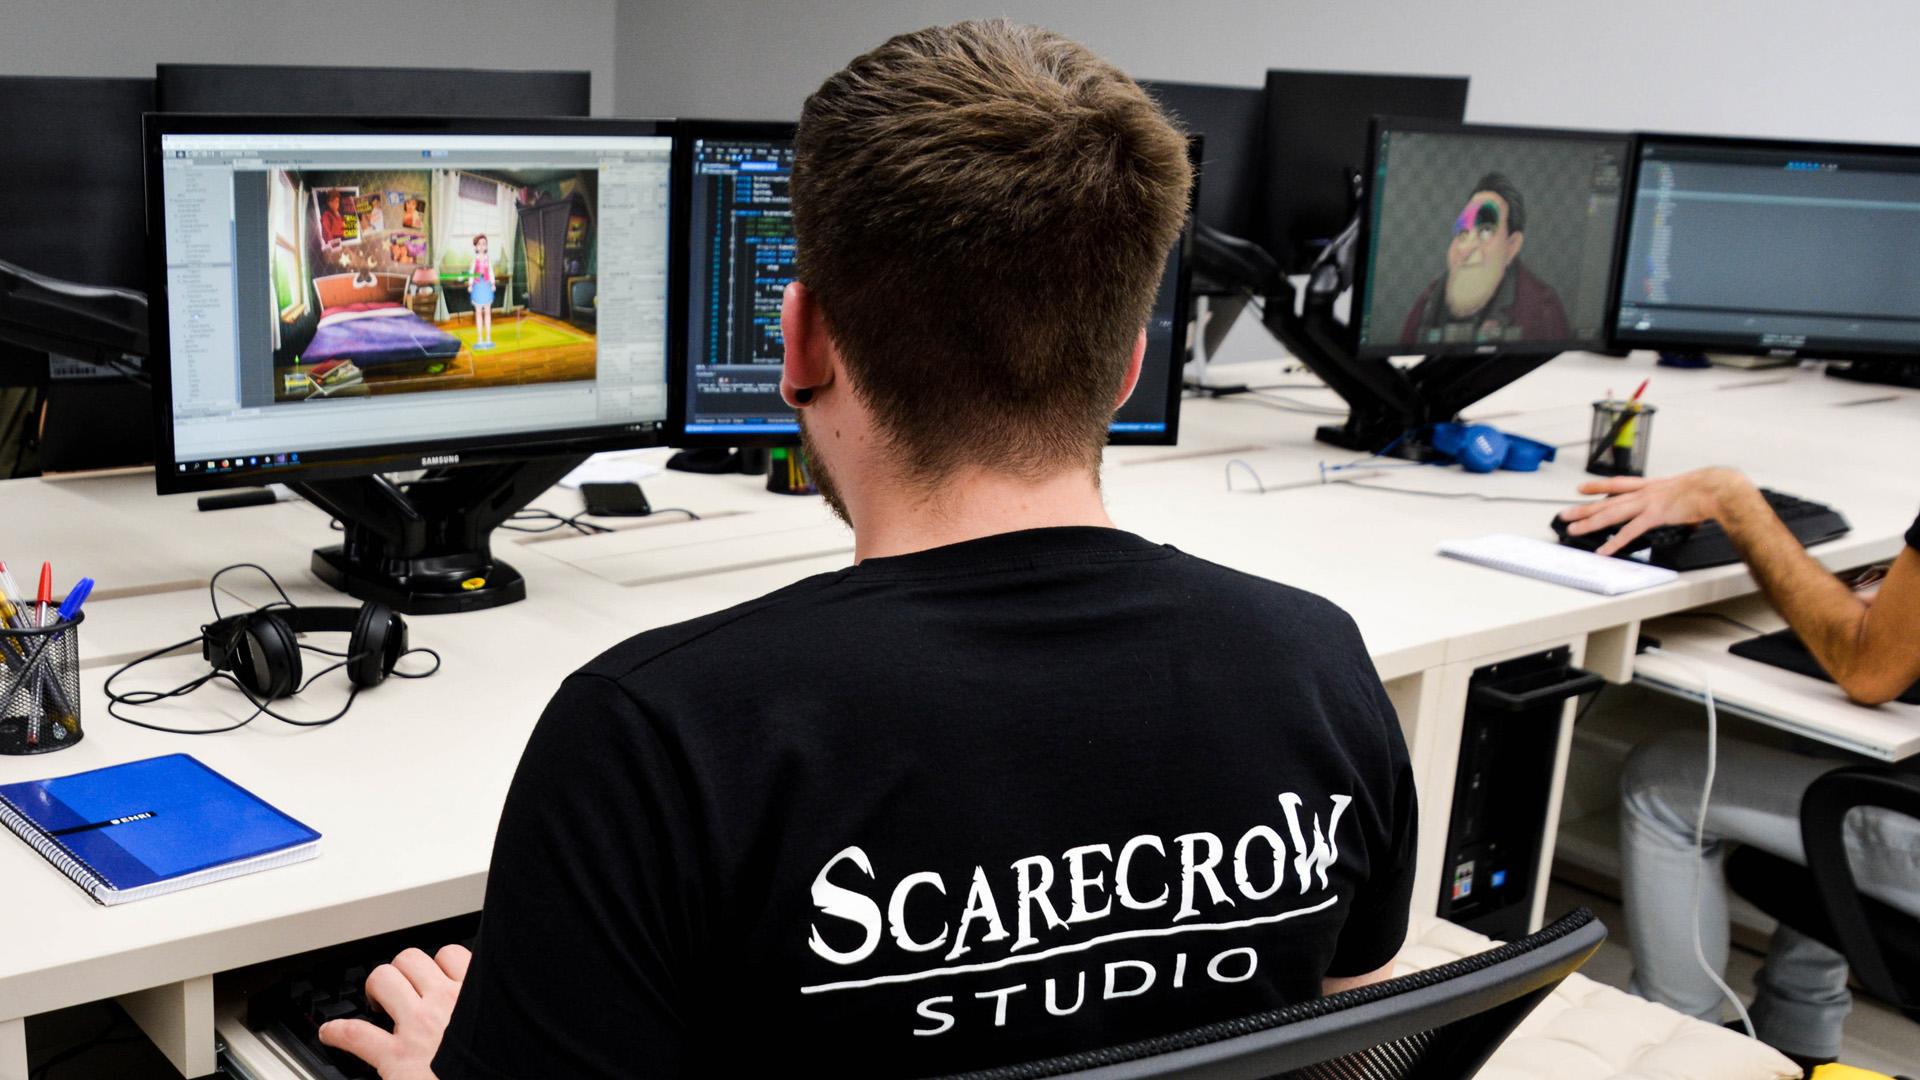 Scarecrow_Studio_Team_and_Office.1.jpg